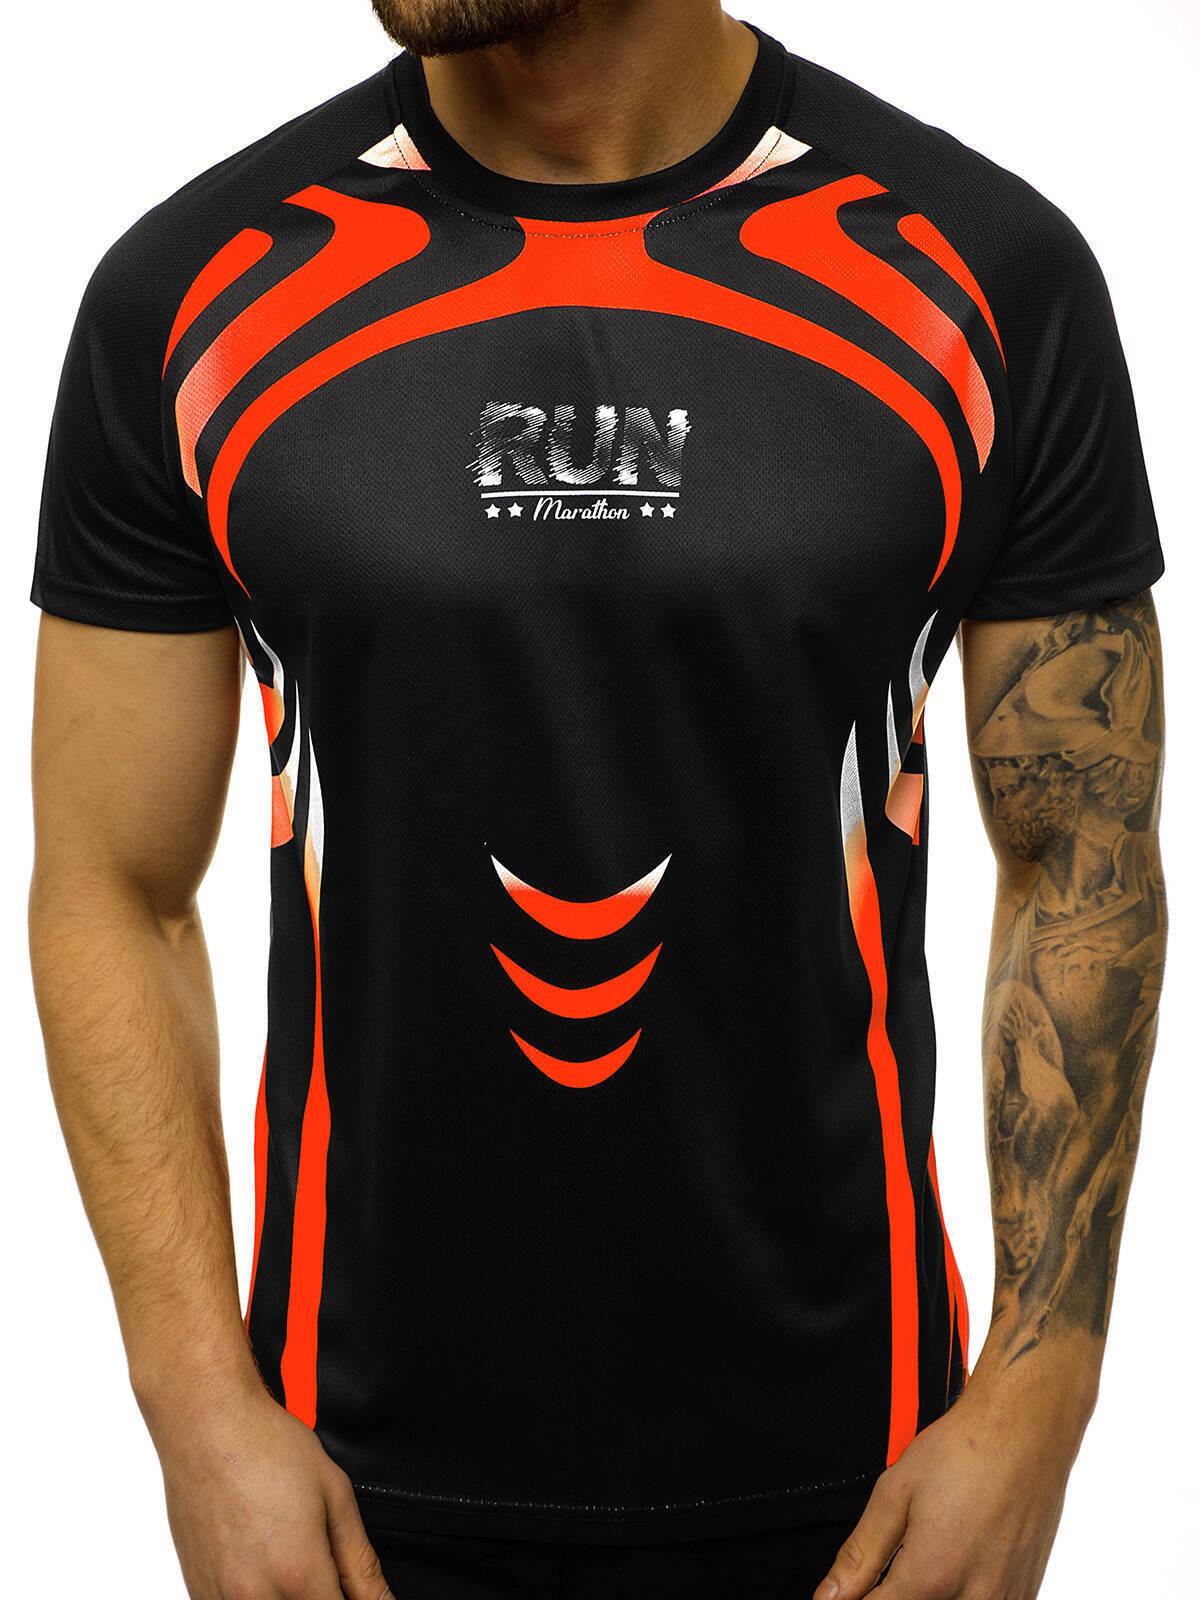 Indexbild 4 - T-Shirt Kurzarm Print Aufdruck Fitness Jogging Sport Shirt Herren OZONEE 12511